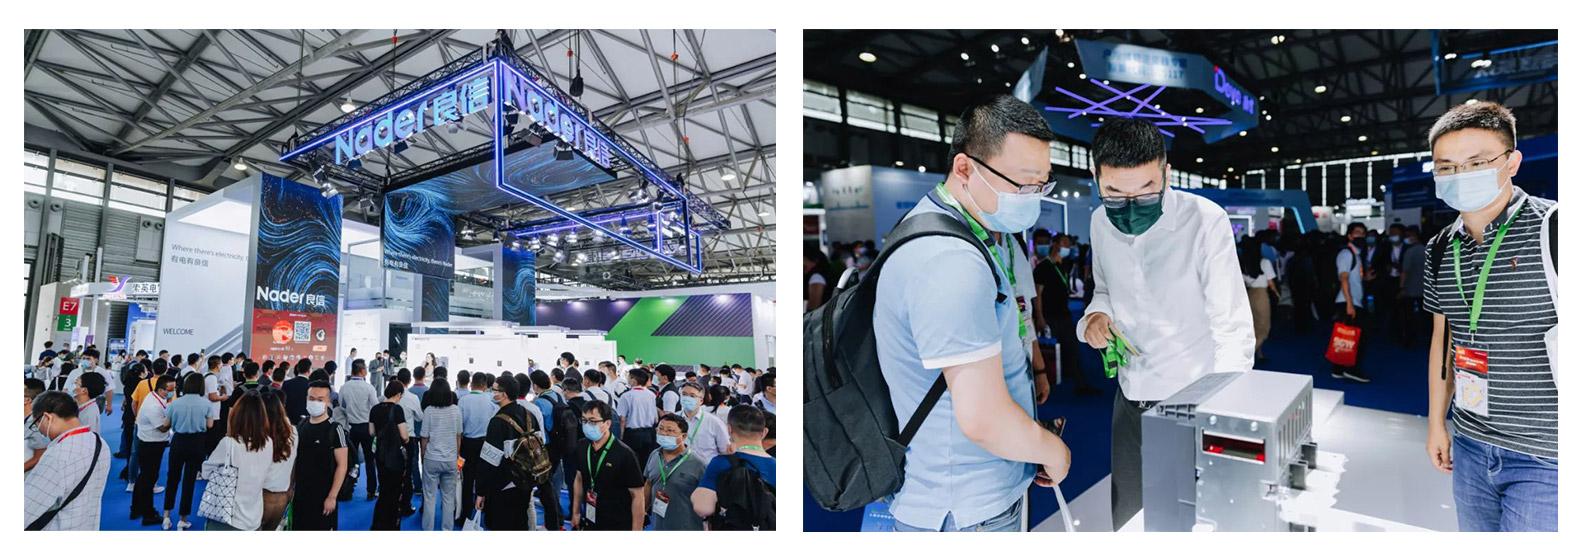 Nader participates in SNEC 2021 International Solar Photovoltaic Exhibition